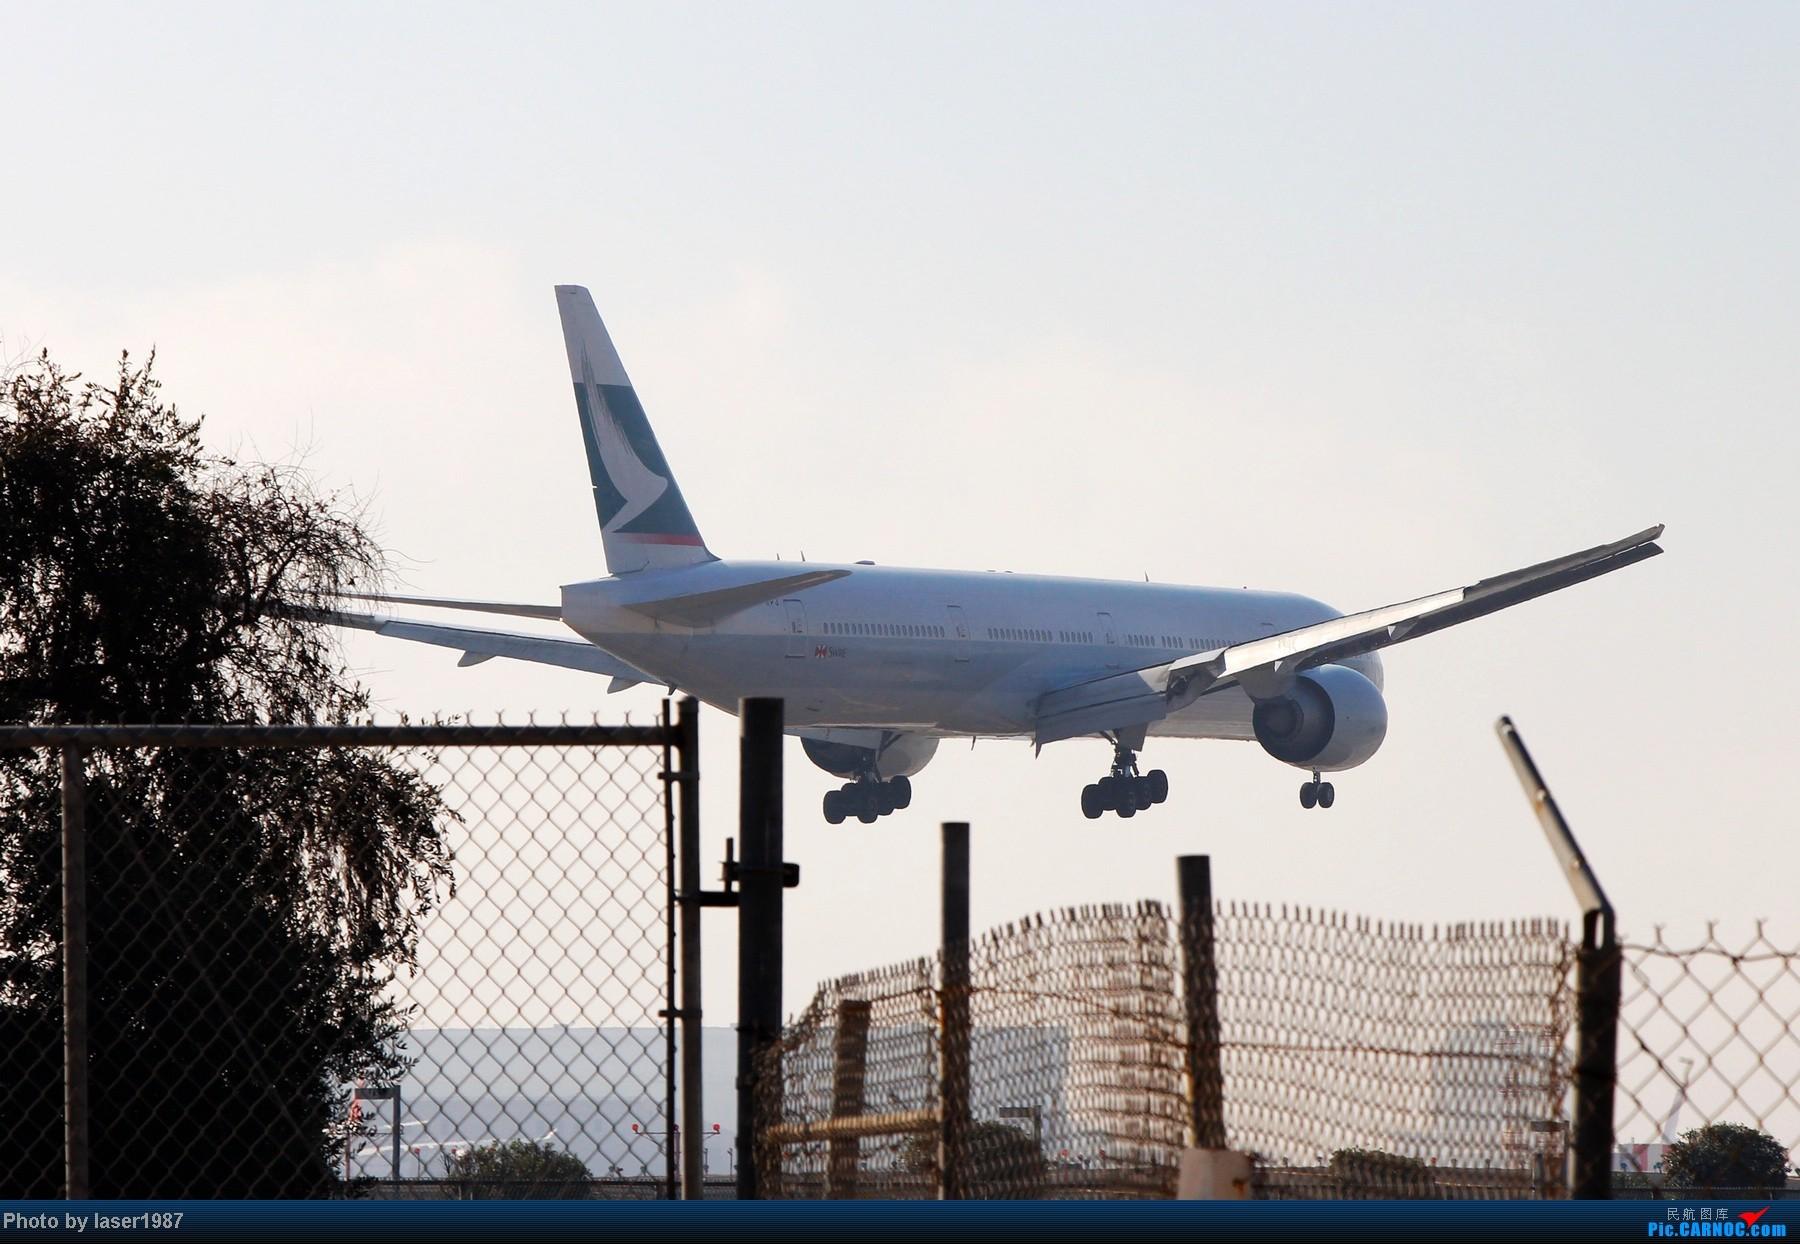 Re:[原创]2011.12.25 LAX 24R跑道东侧停车场拍飞机 BOEING 777  LAX